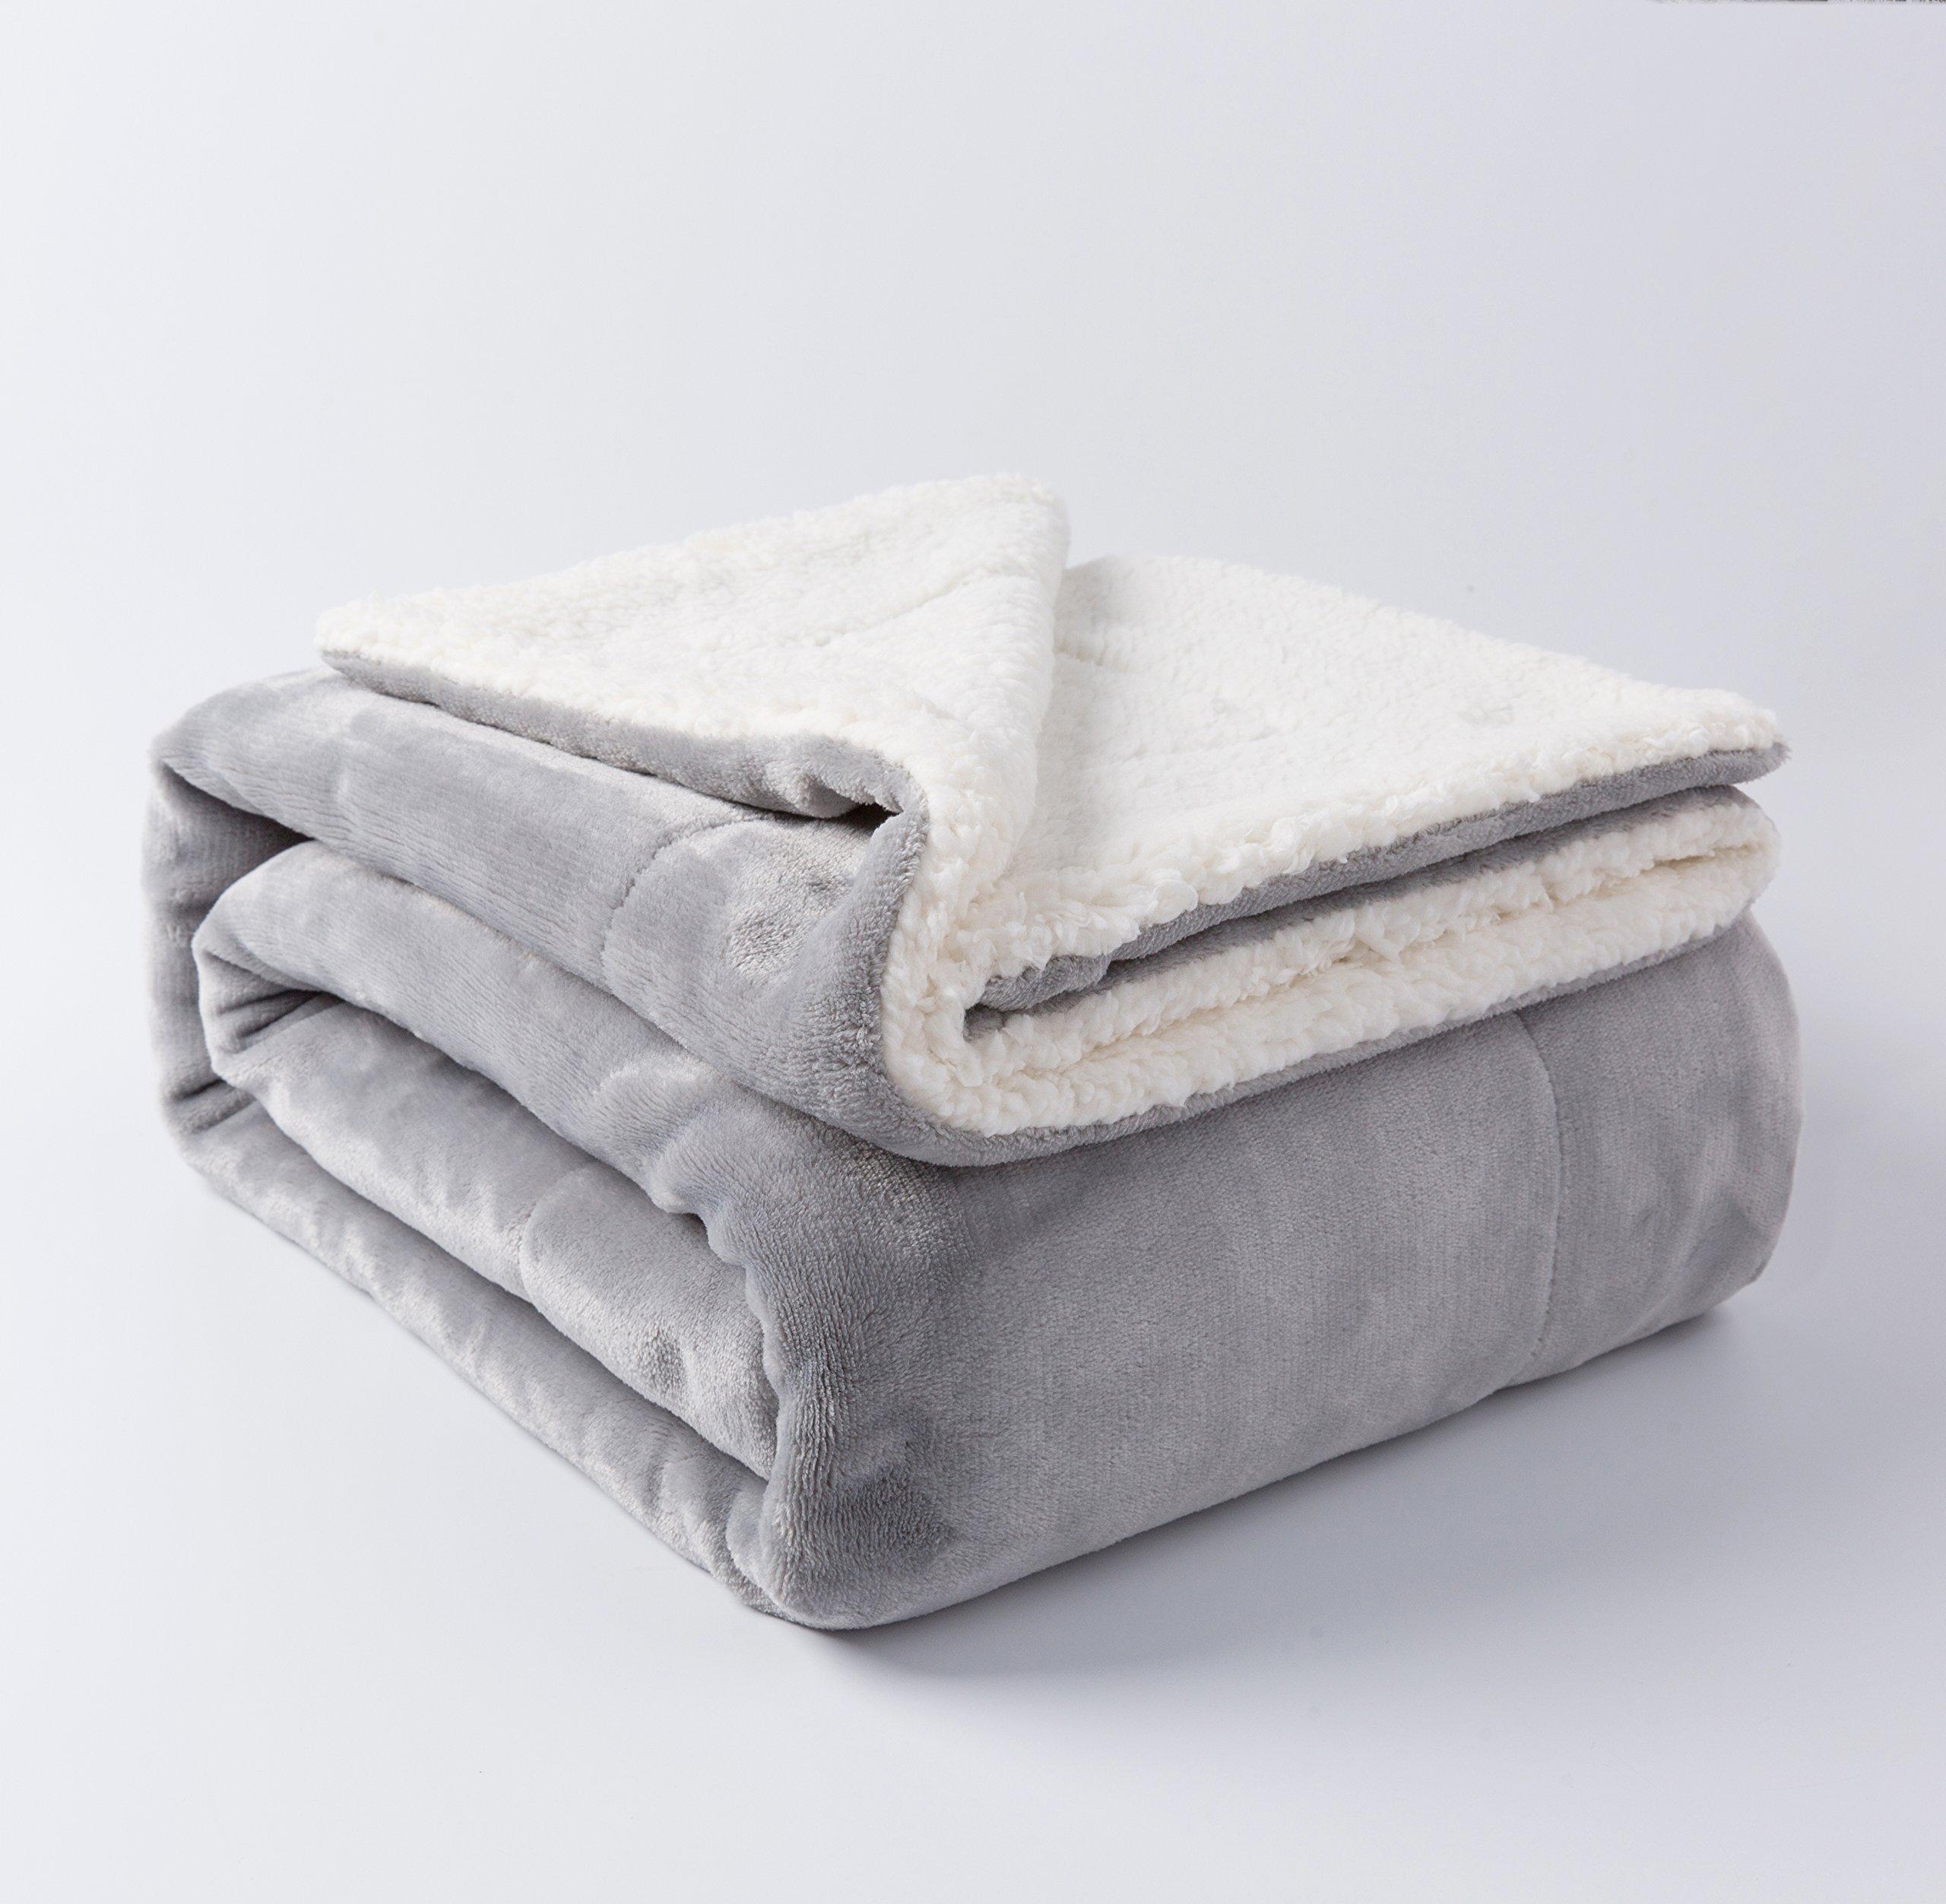 NANPIPER Sherpa Throw Light Grey 50''x60'' Ultra-plush Bed Blanket Soft Warm Throw